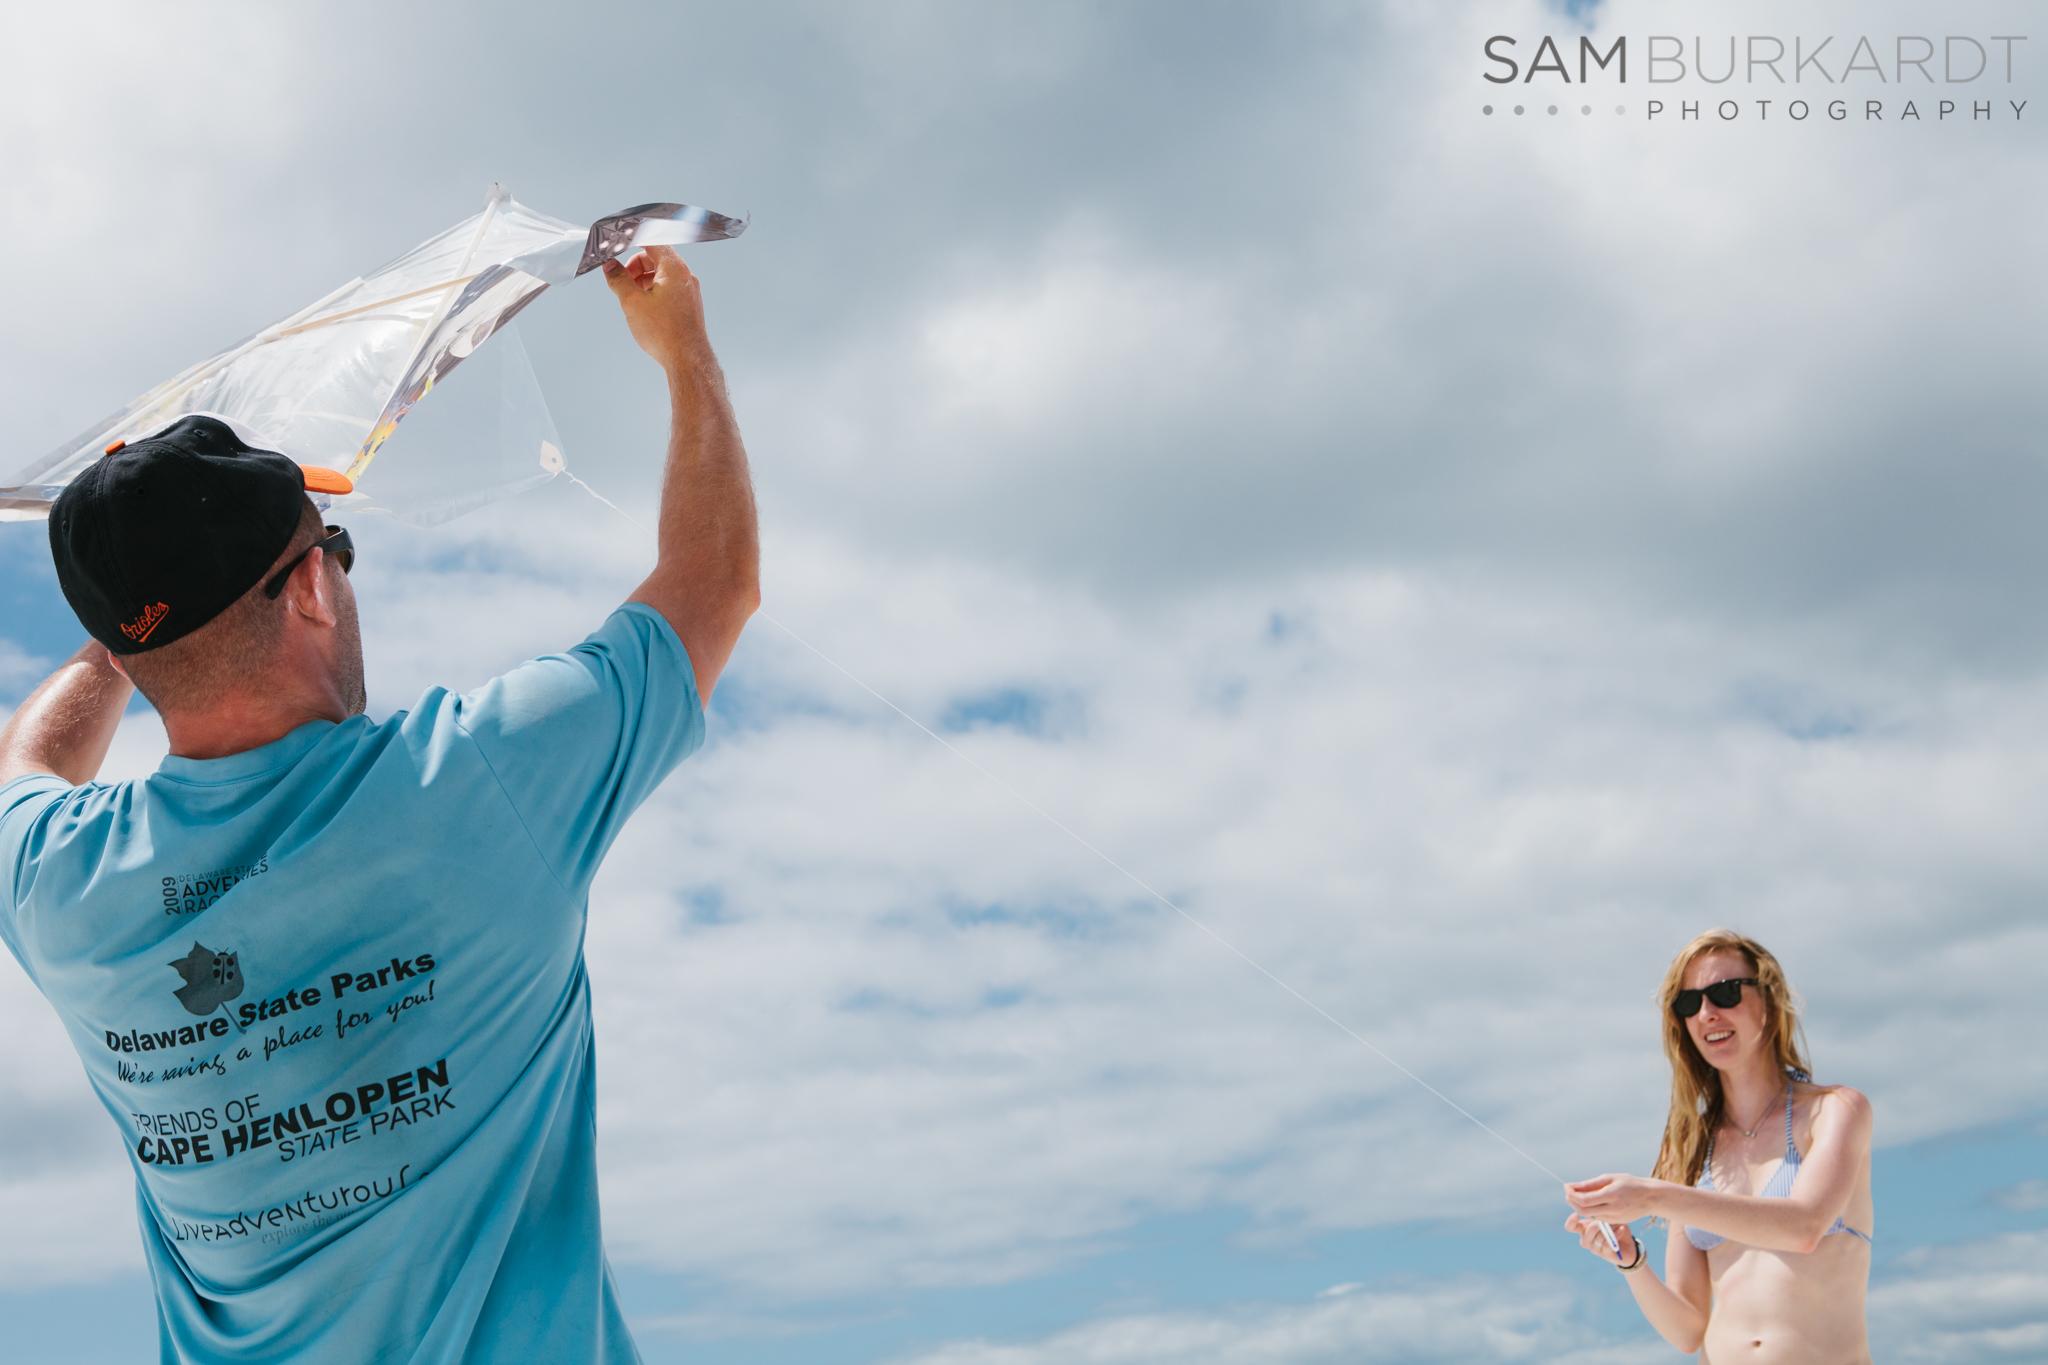 samburkardt_engagement_vacation_beach_cape_san_blas_florida_camping_gopro_0020.jpg